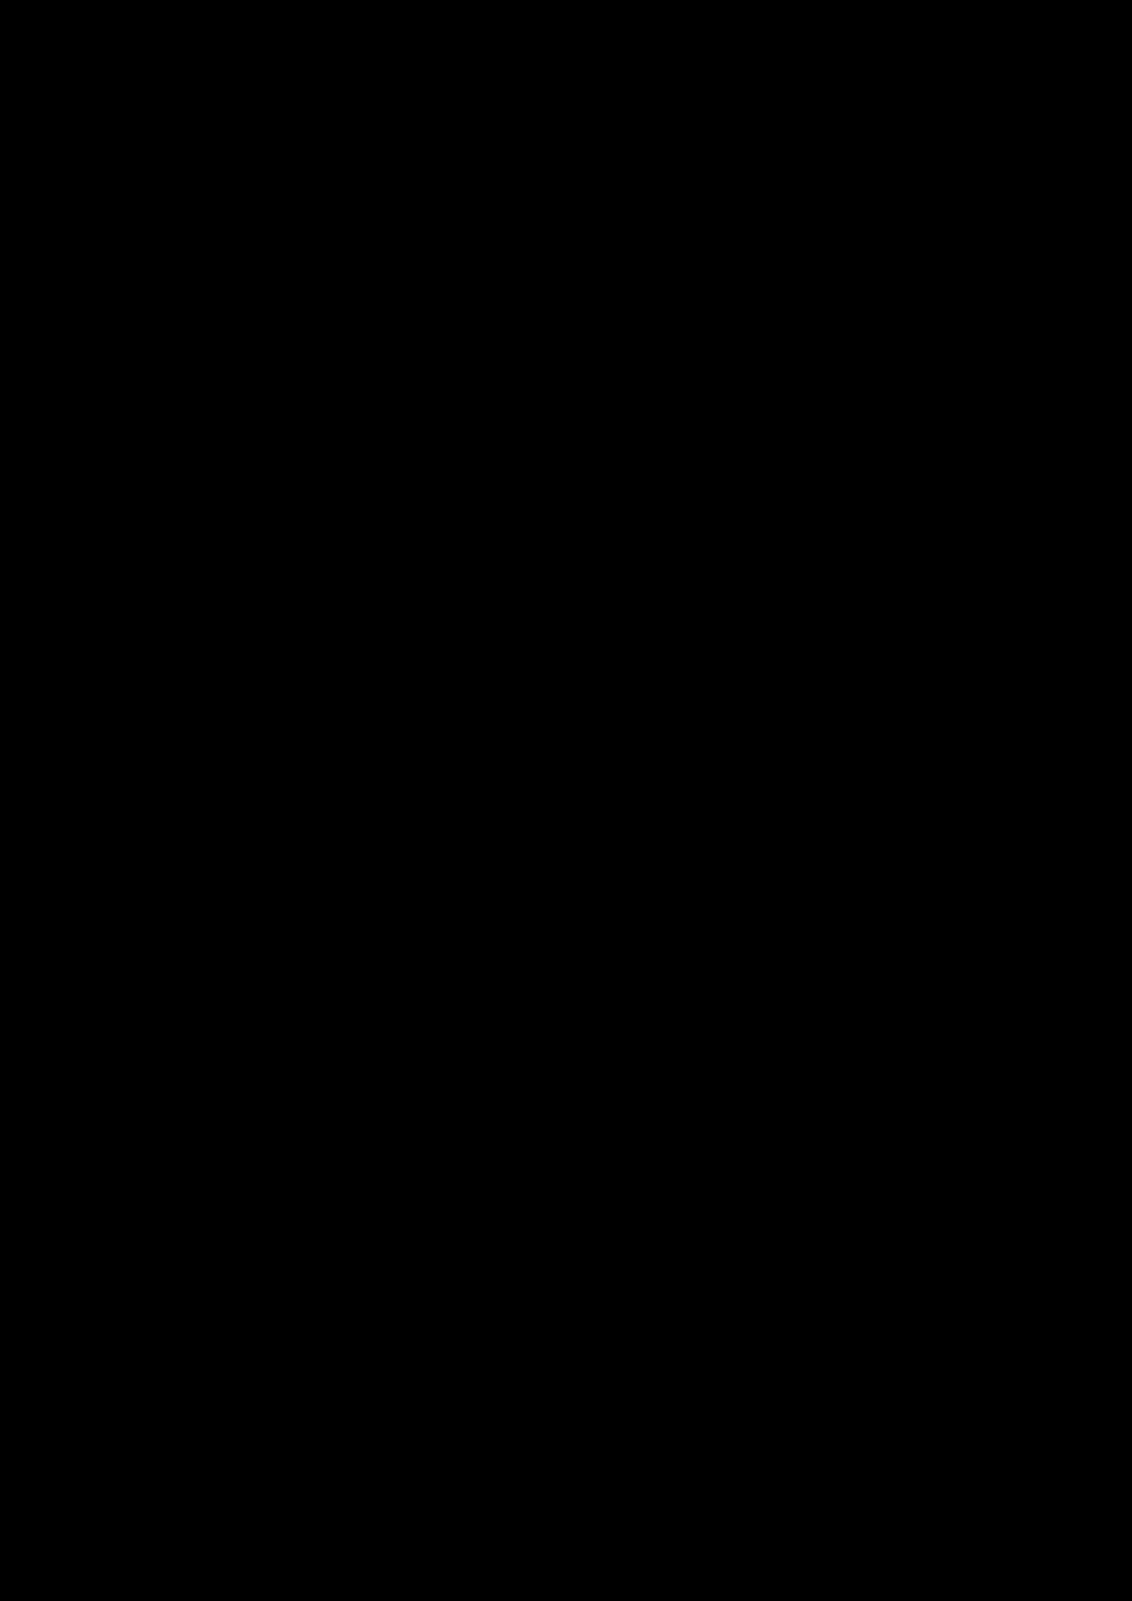 Korolevstvo slez slide, Image 78